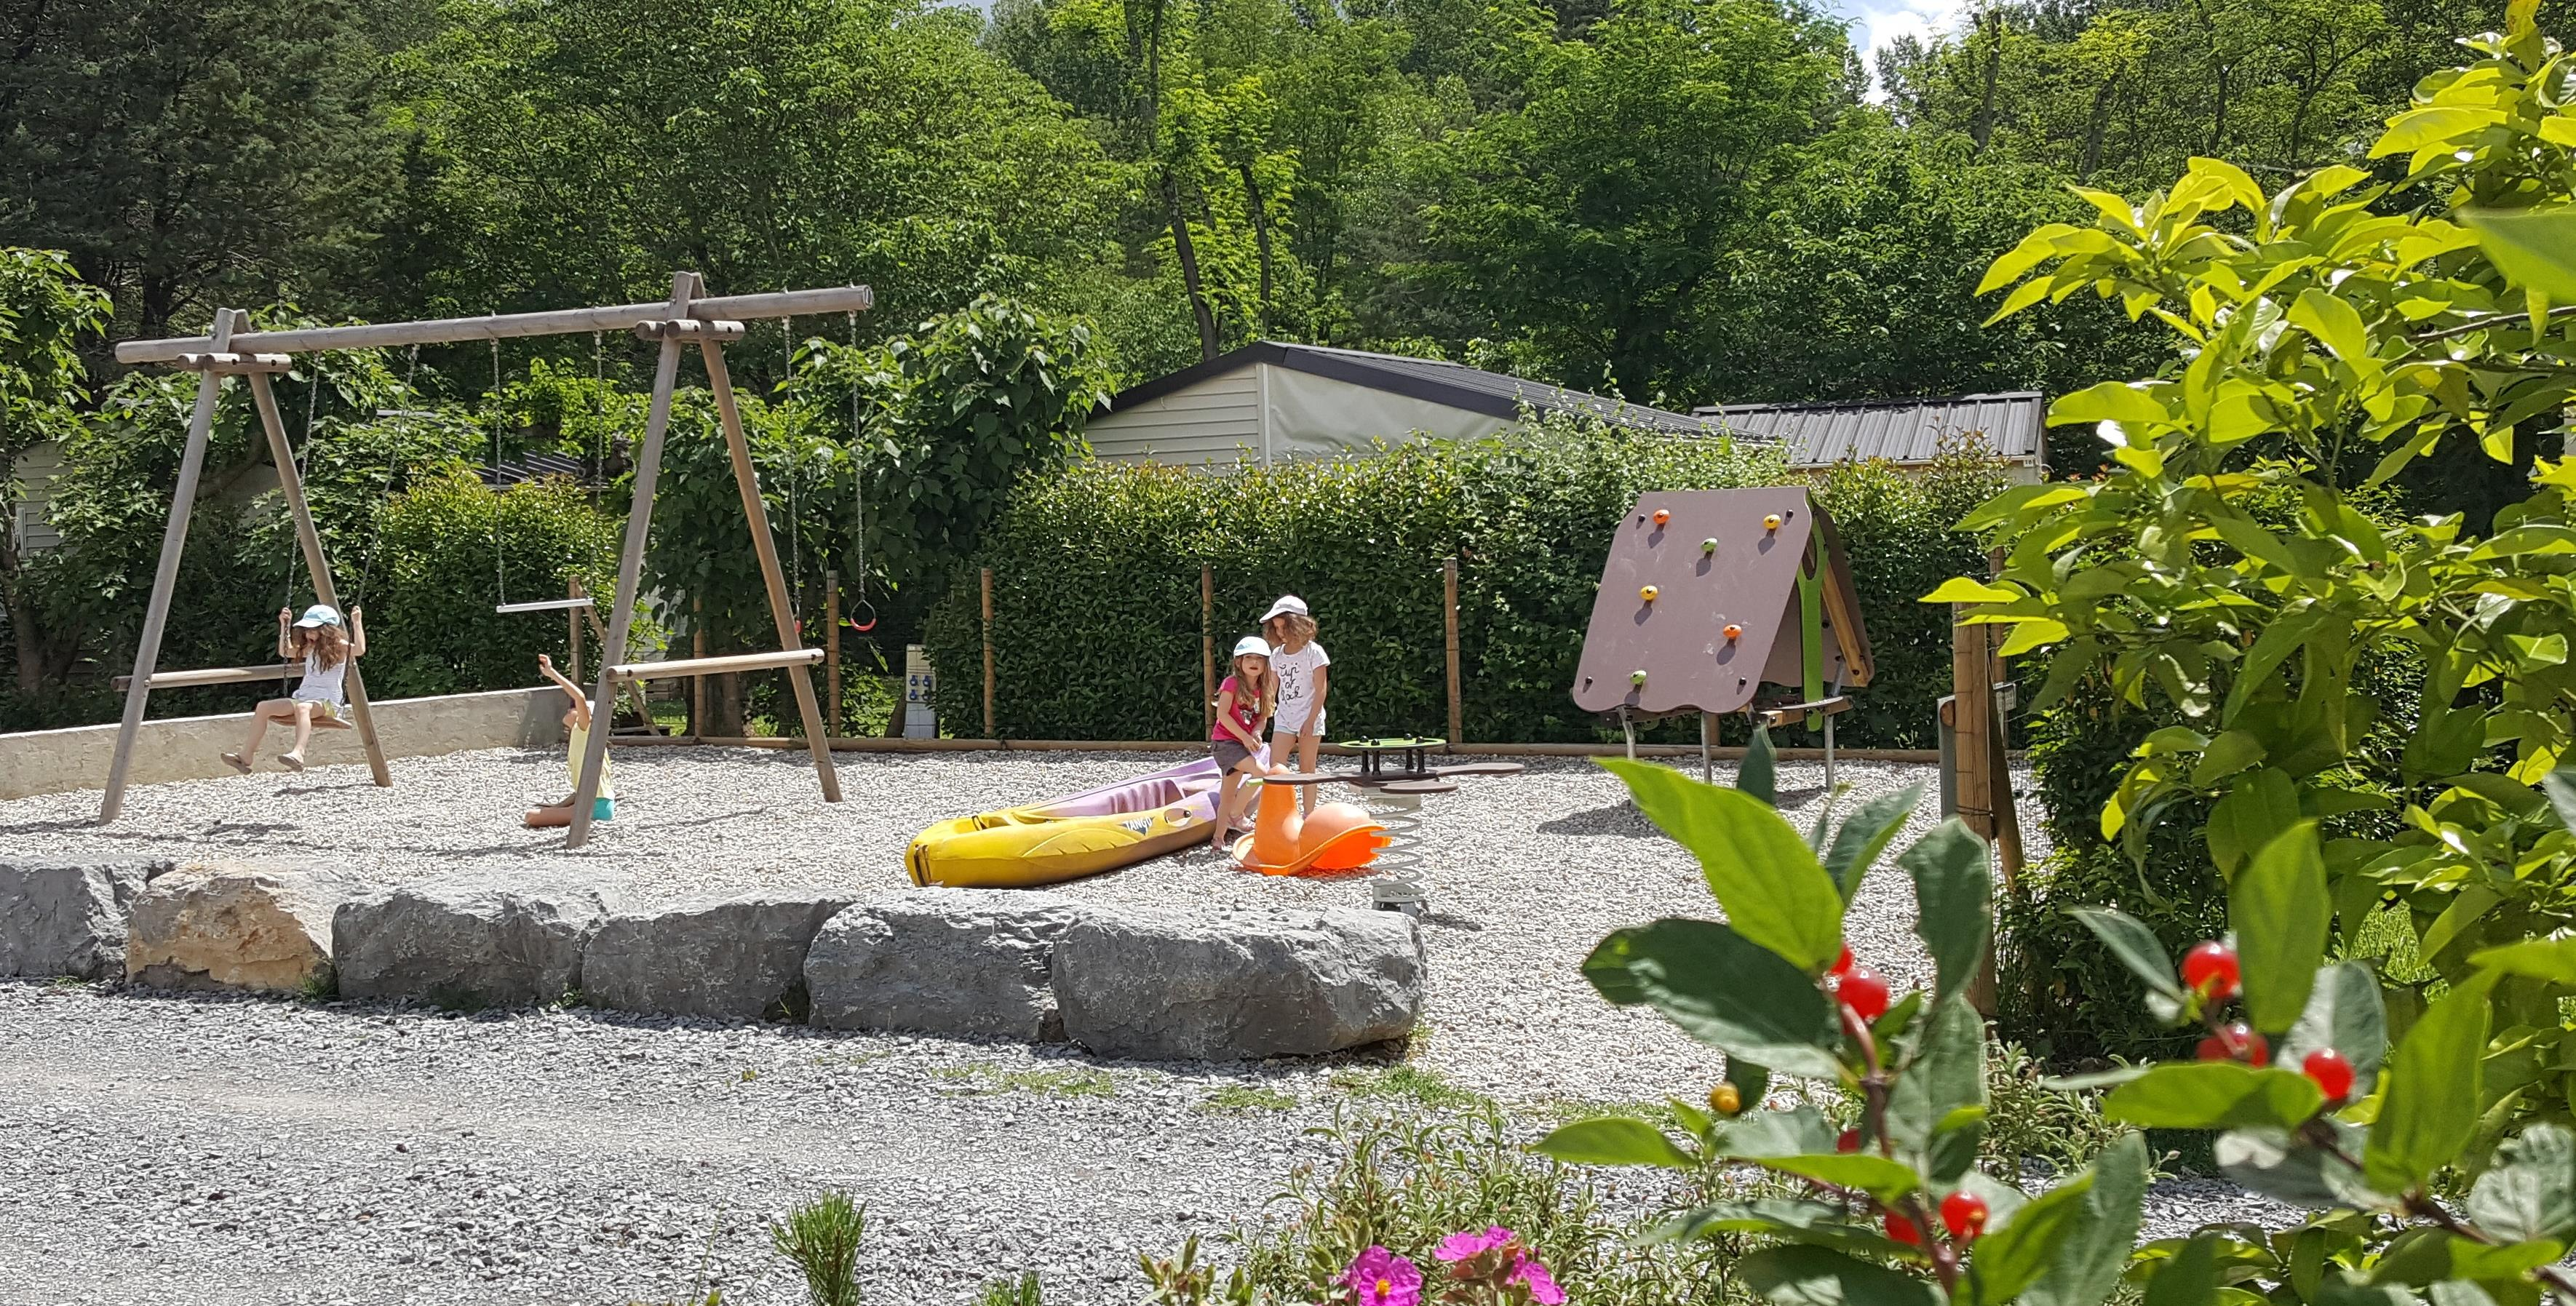 Camping le Coin Charmant, Chauzon, Ardèche